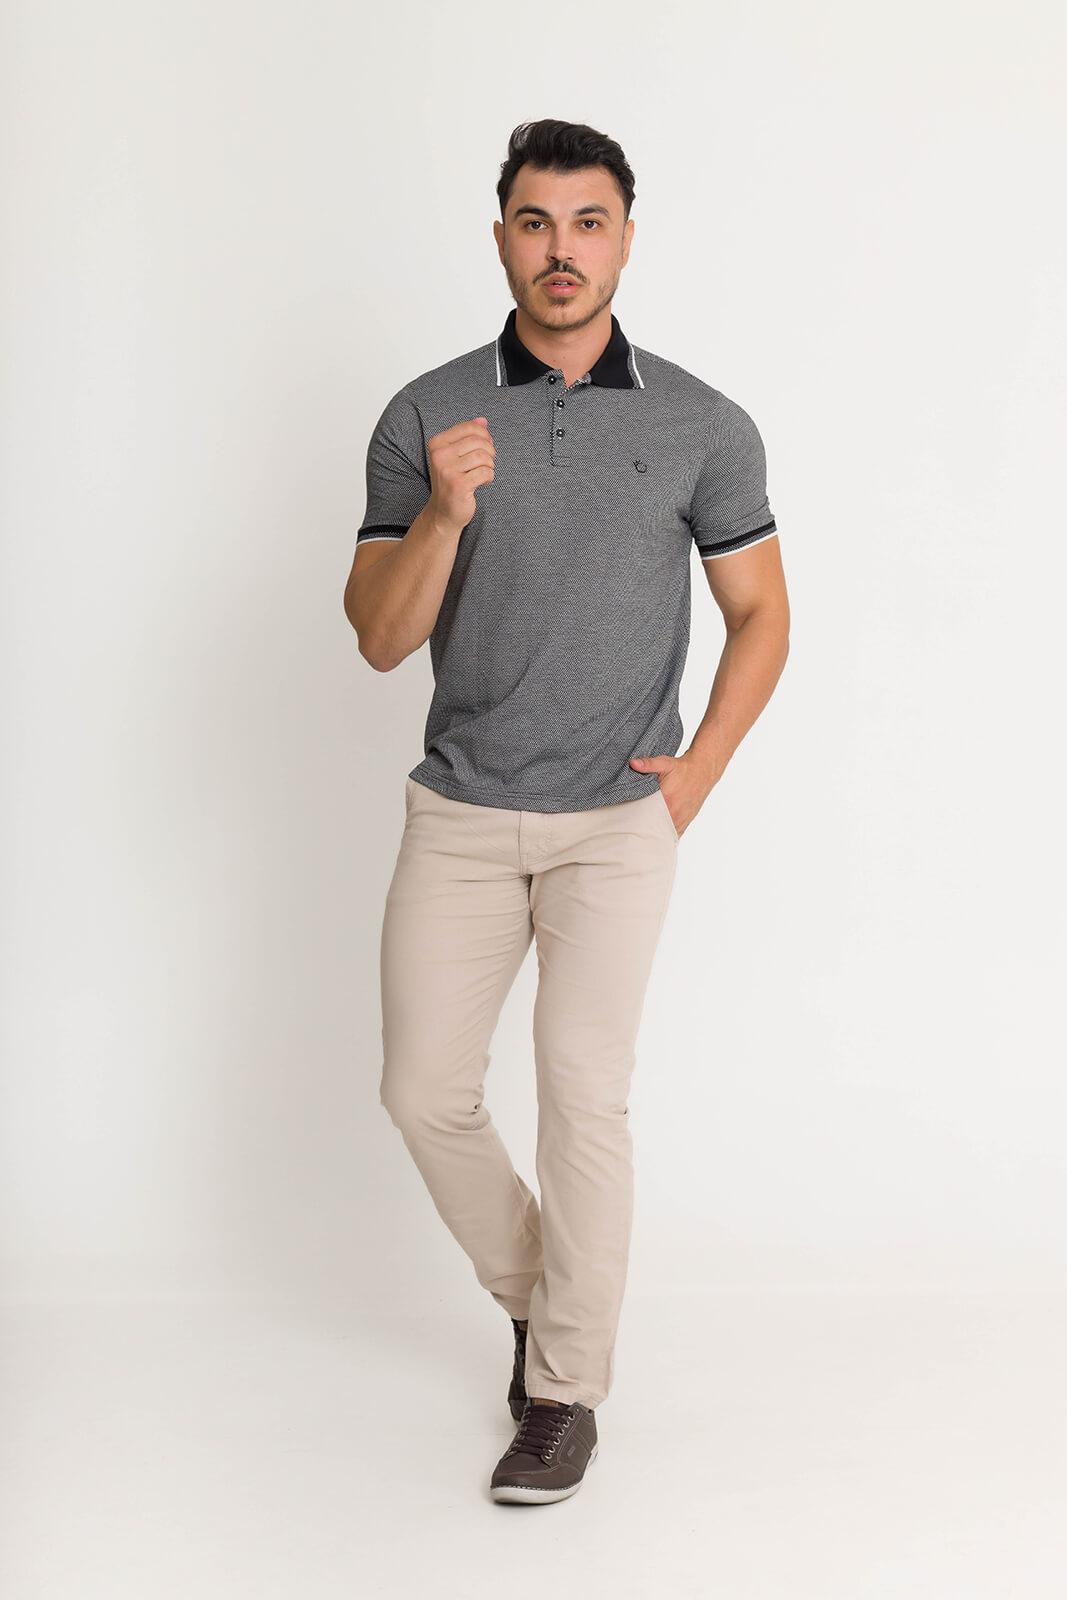 Camisa Gola Polo Olimpo Malha Jacguard